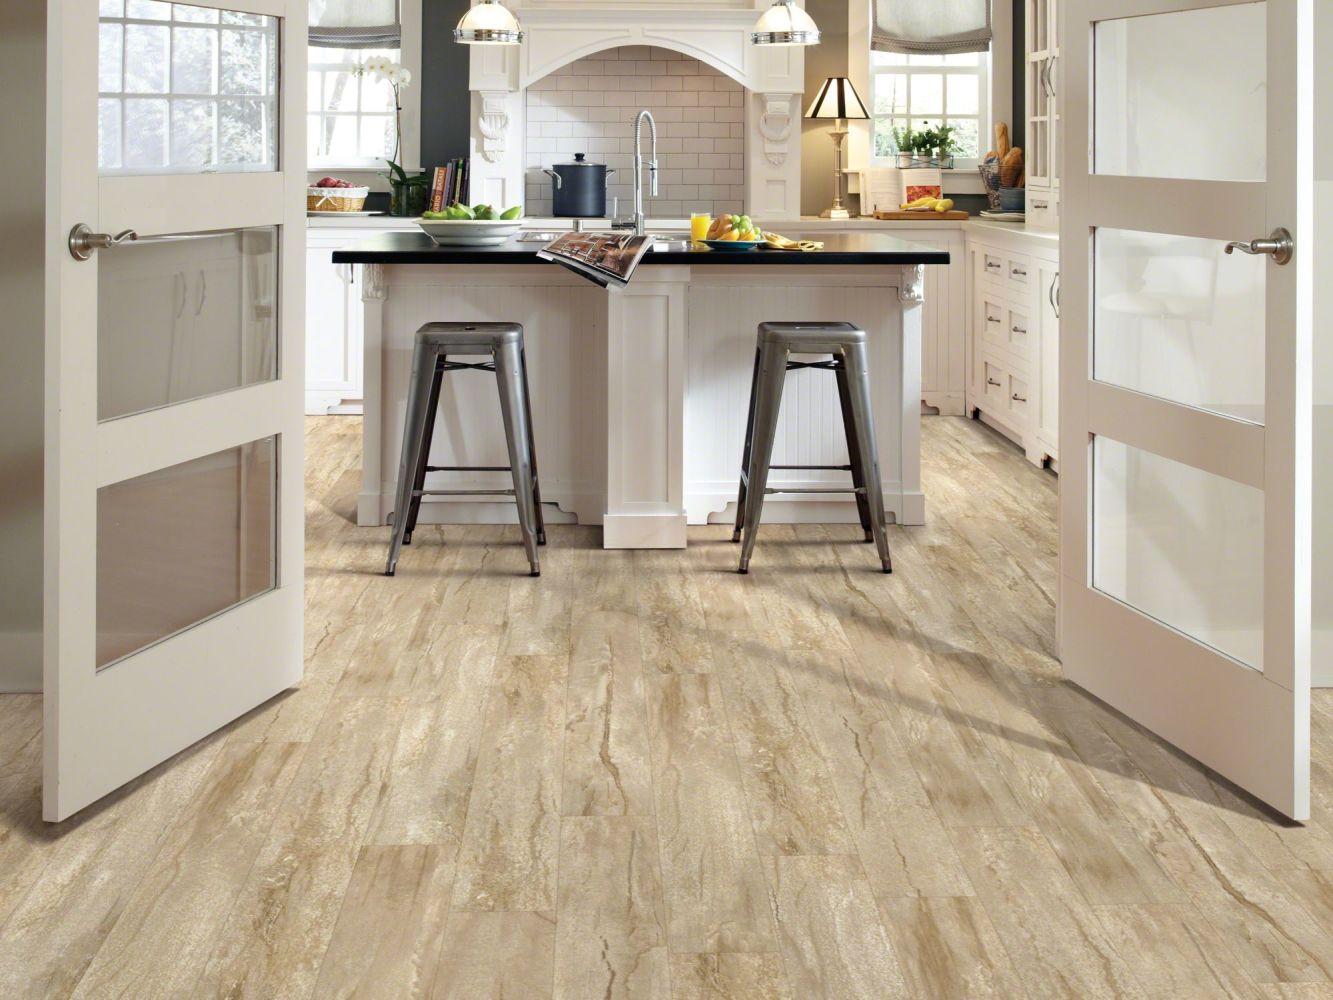 Shaw Floors Vinyl Residential Classico Plus Plank Latte 00209_2426V